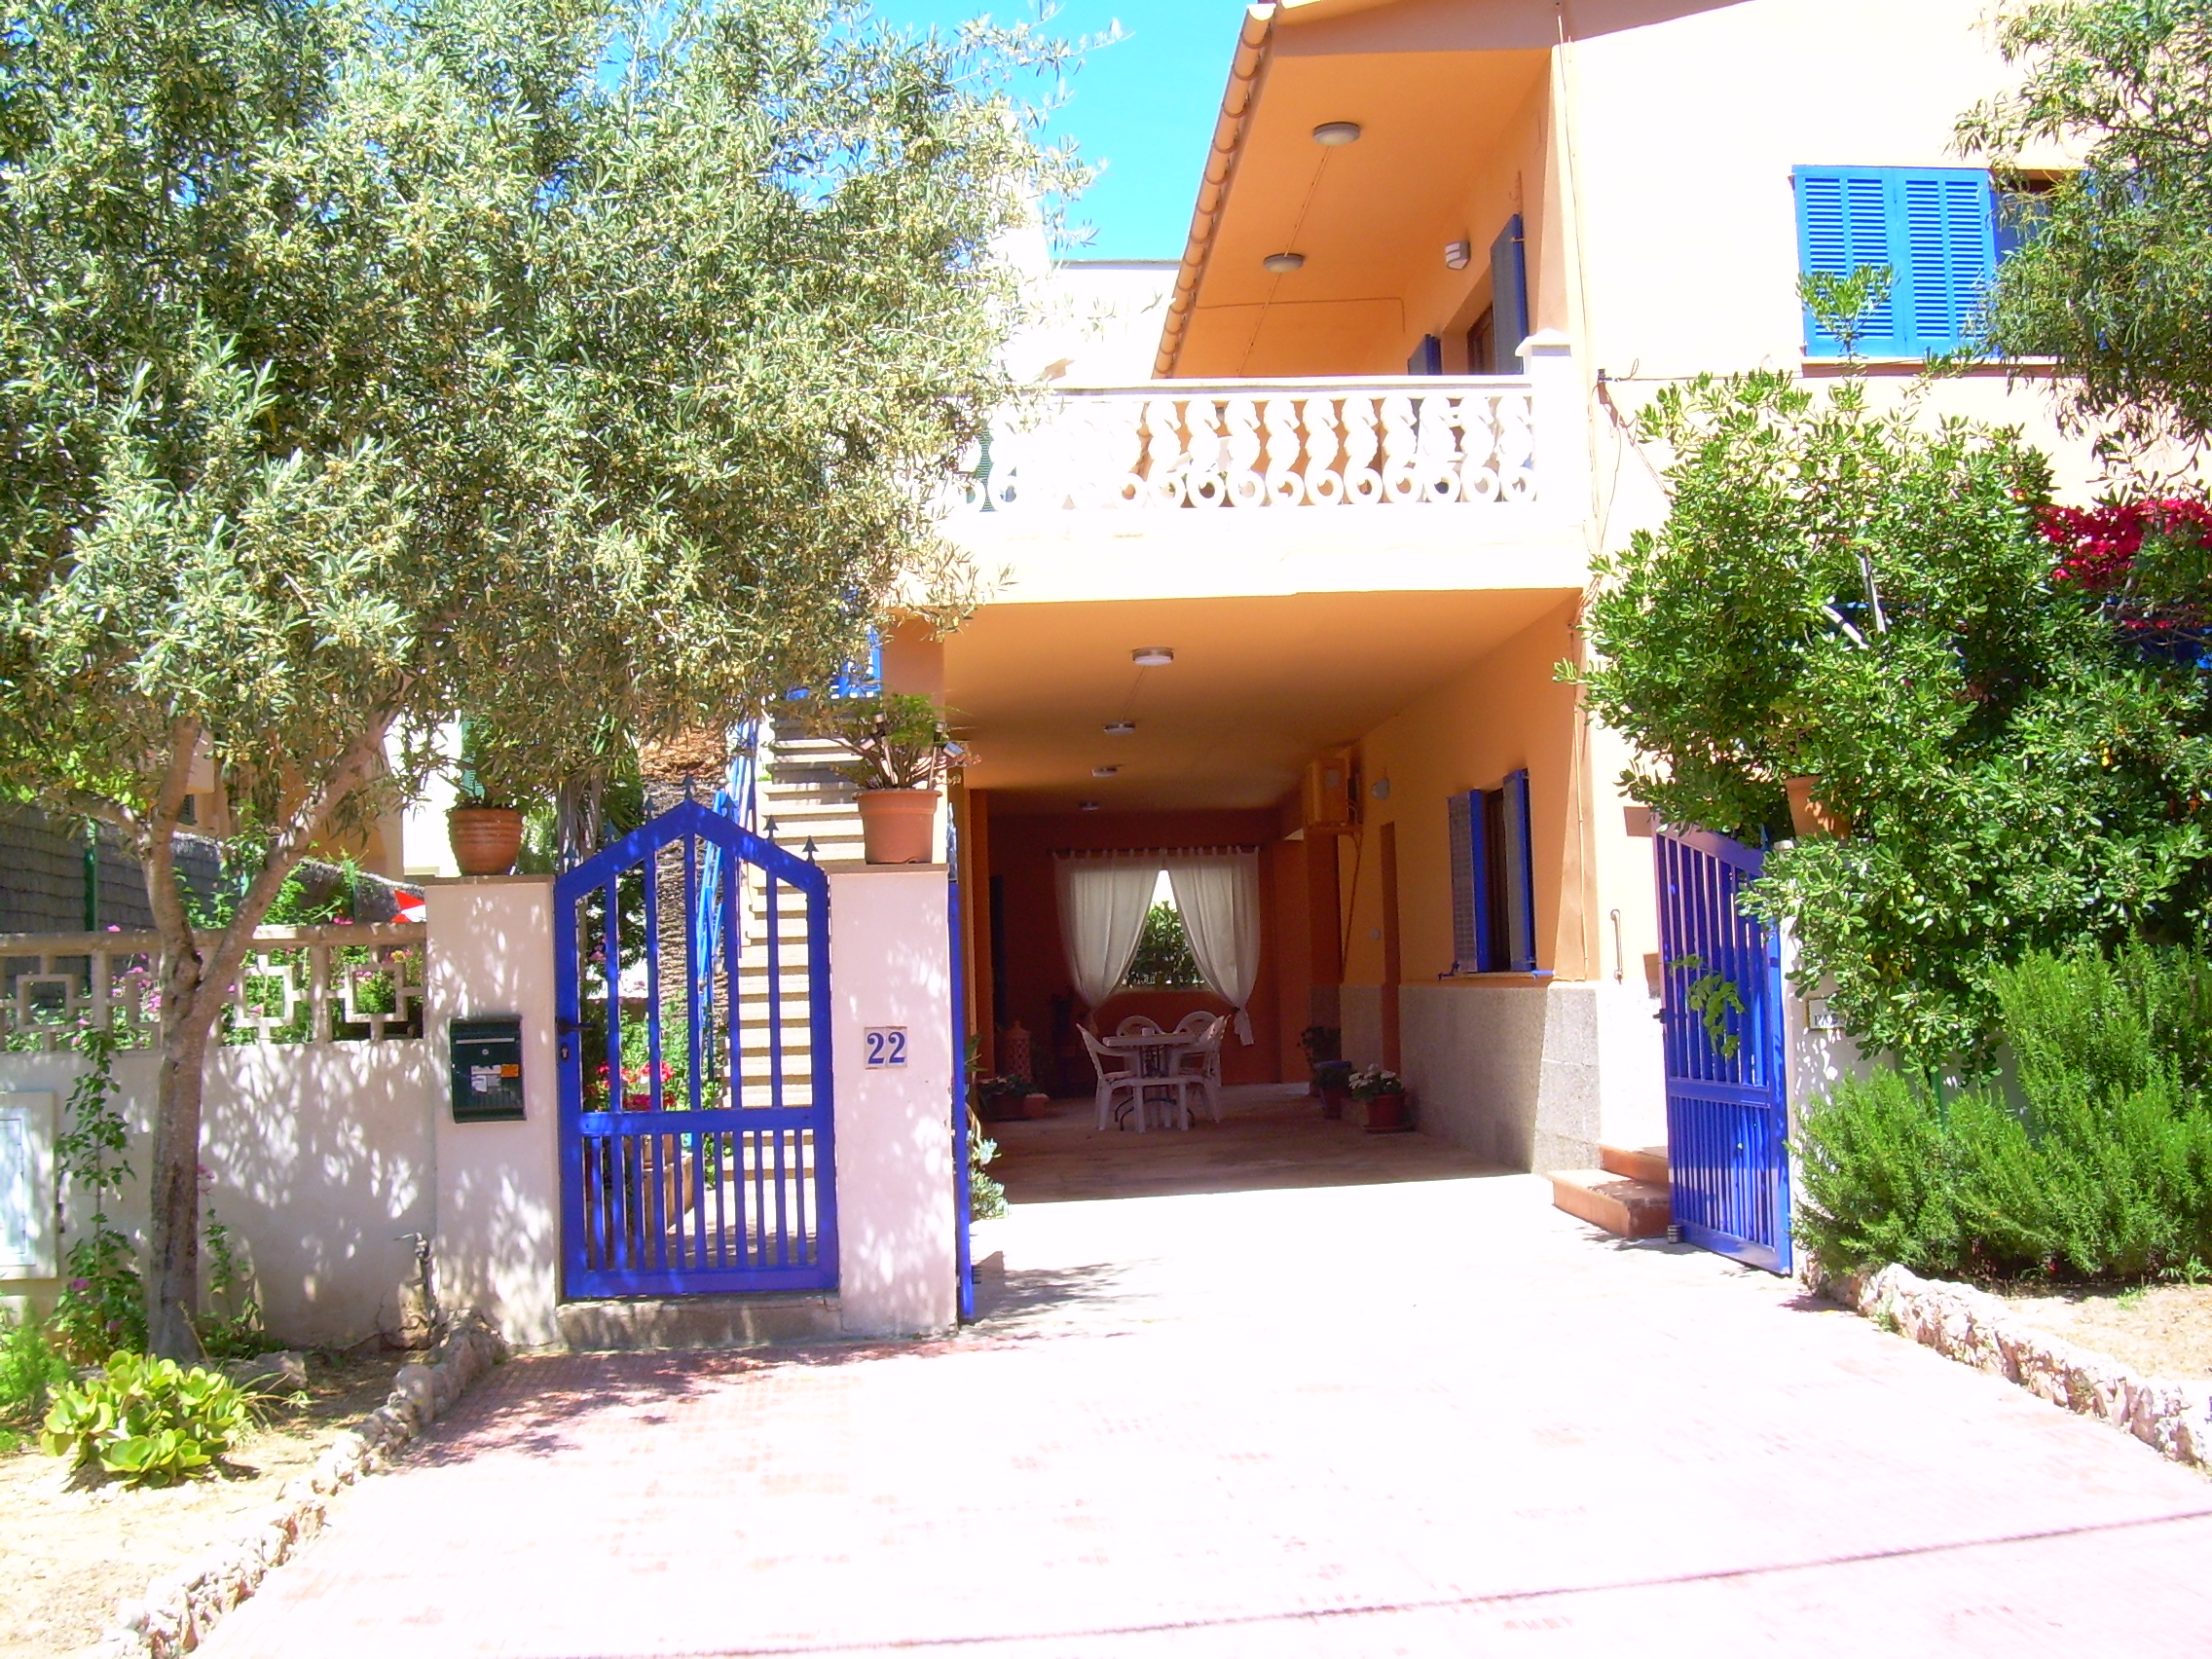 3 Bed Short Term Rental Apartment Colonia Sant Jordi